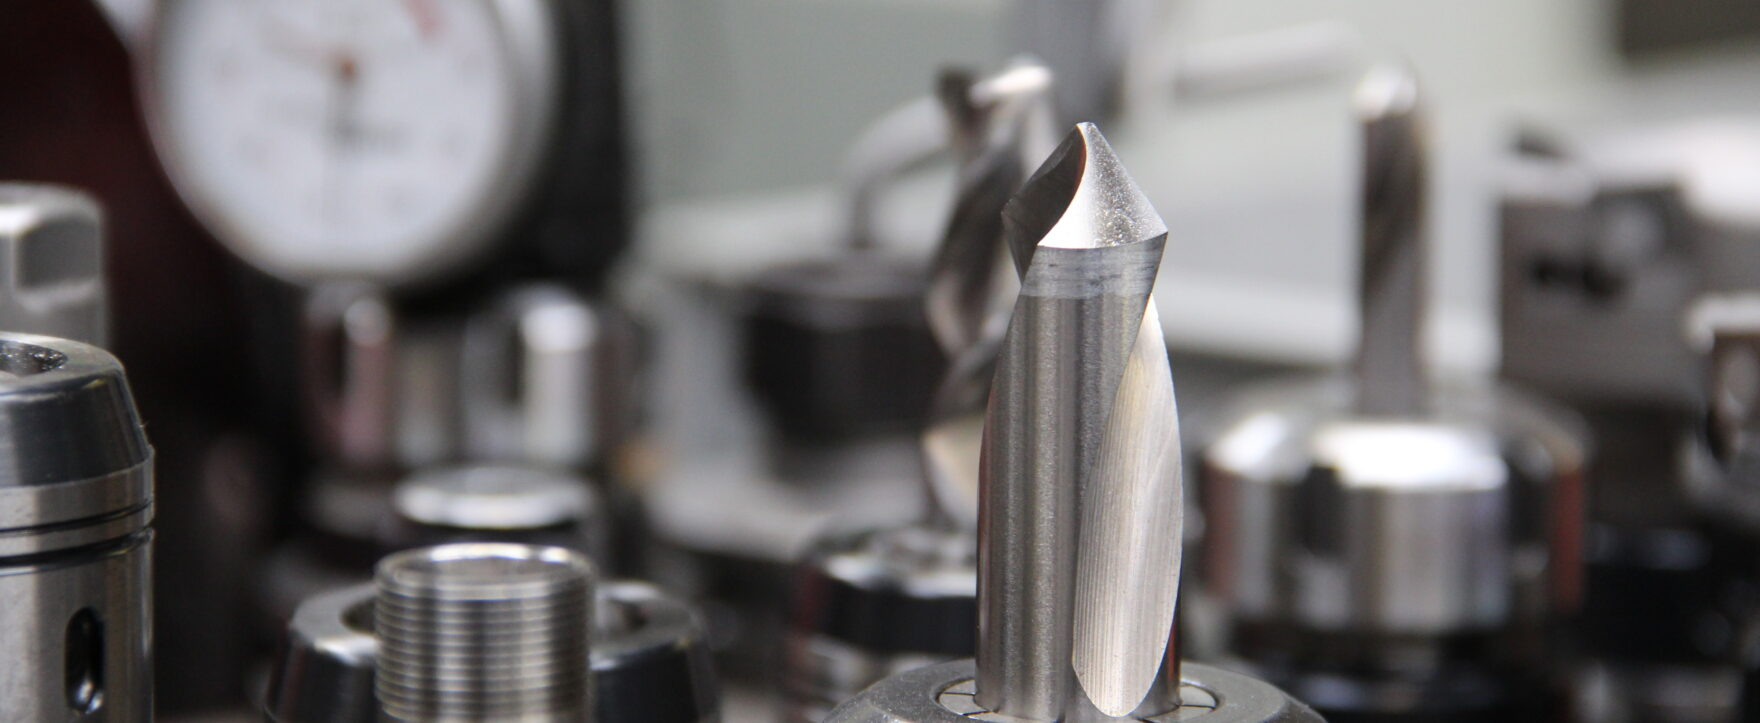 Precision Component Manufacturers